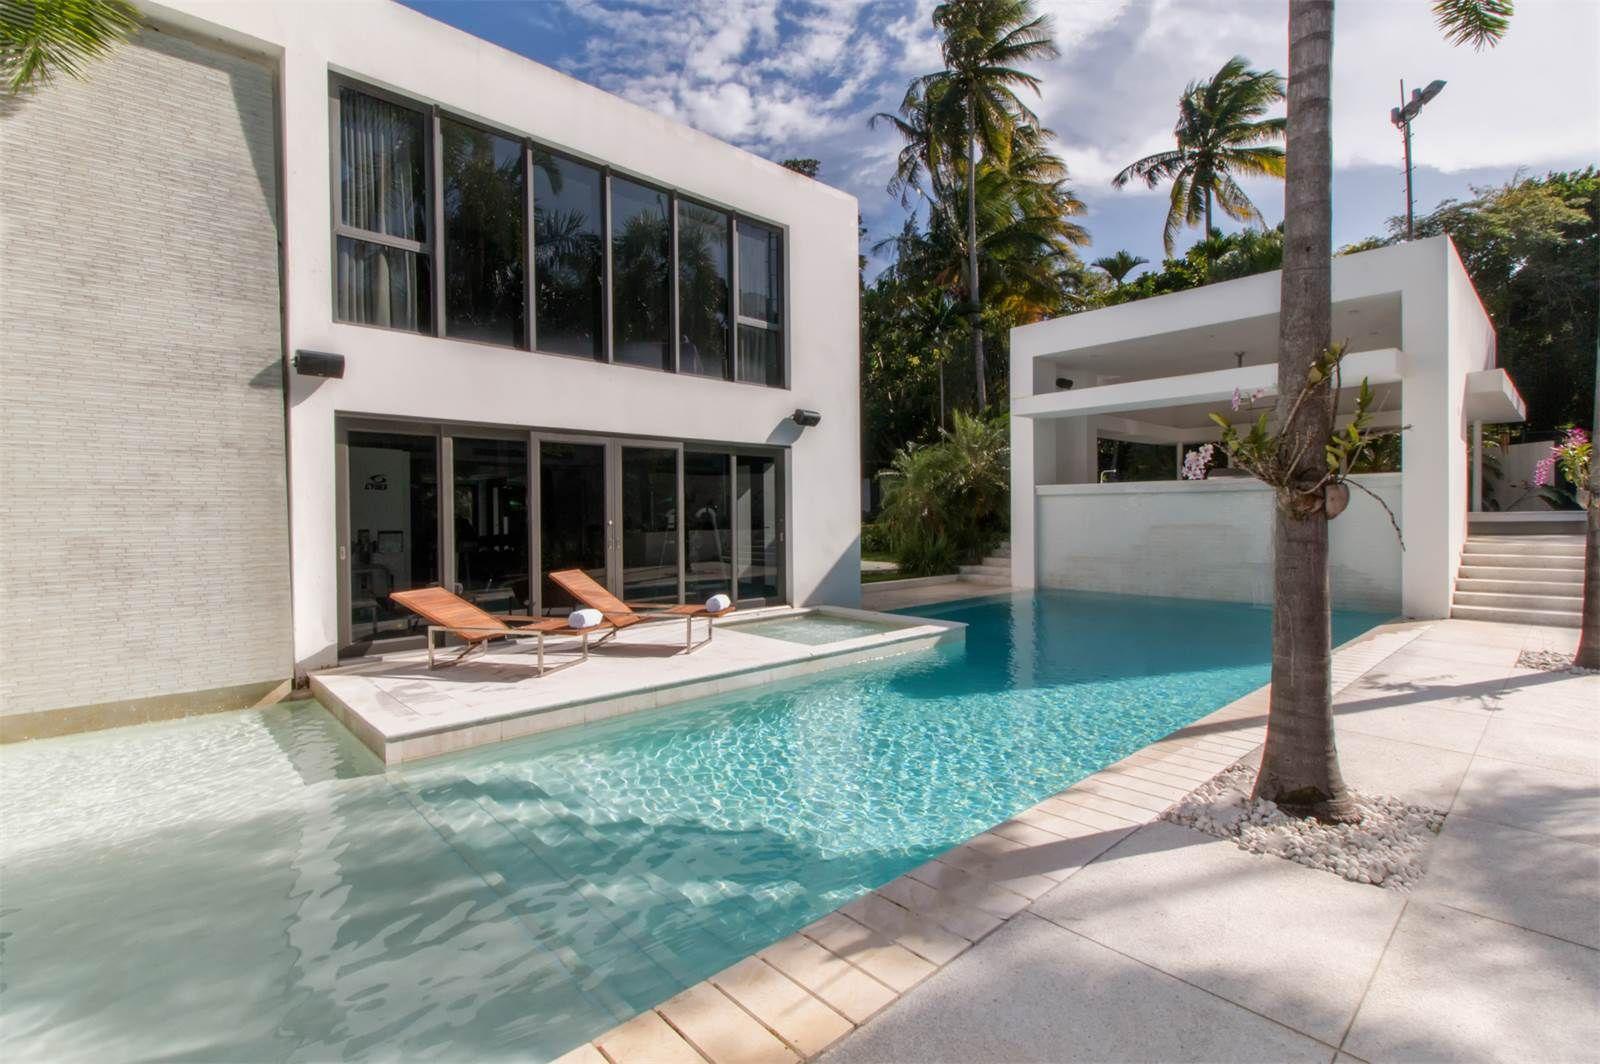 Magnificent Stately Property At 22 Dorado Beach Estates Puerto Rico Luxury Real Estate Visit For Detai Caribbean Real Estate Luxury Real Estate Real Estate